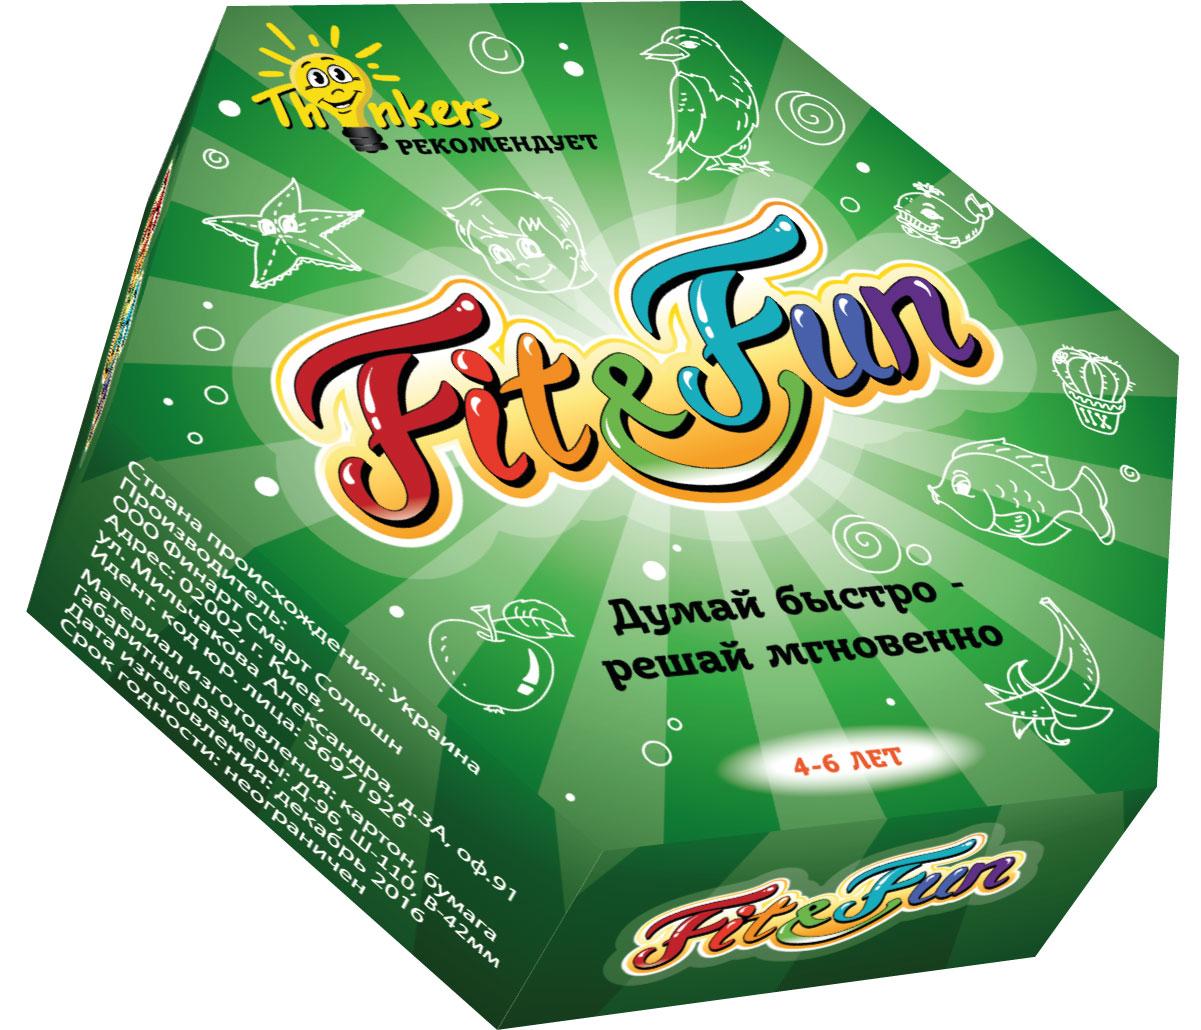 Thinkers Обучающая игра Fit and Fun от 4 до 6 лет